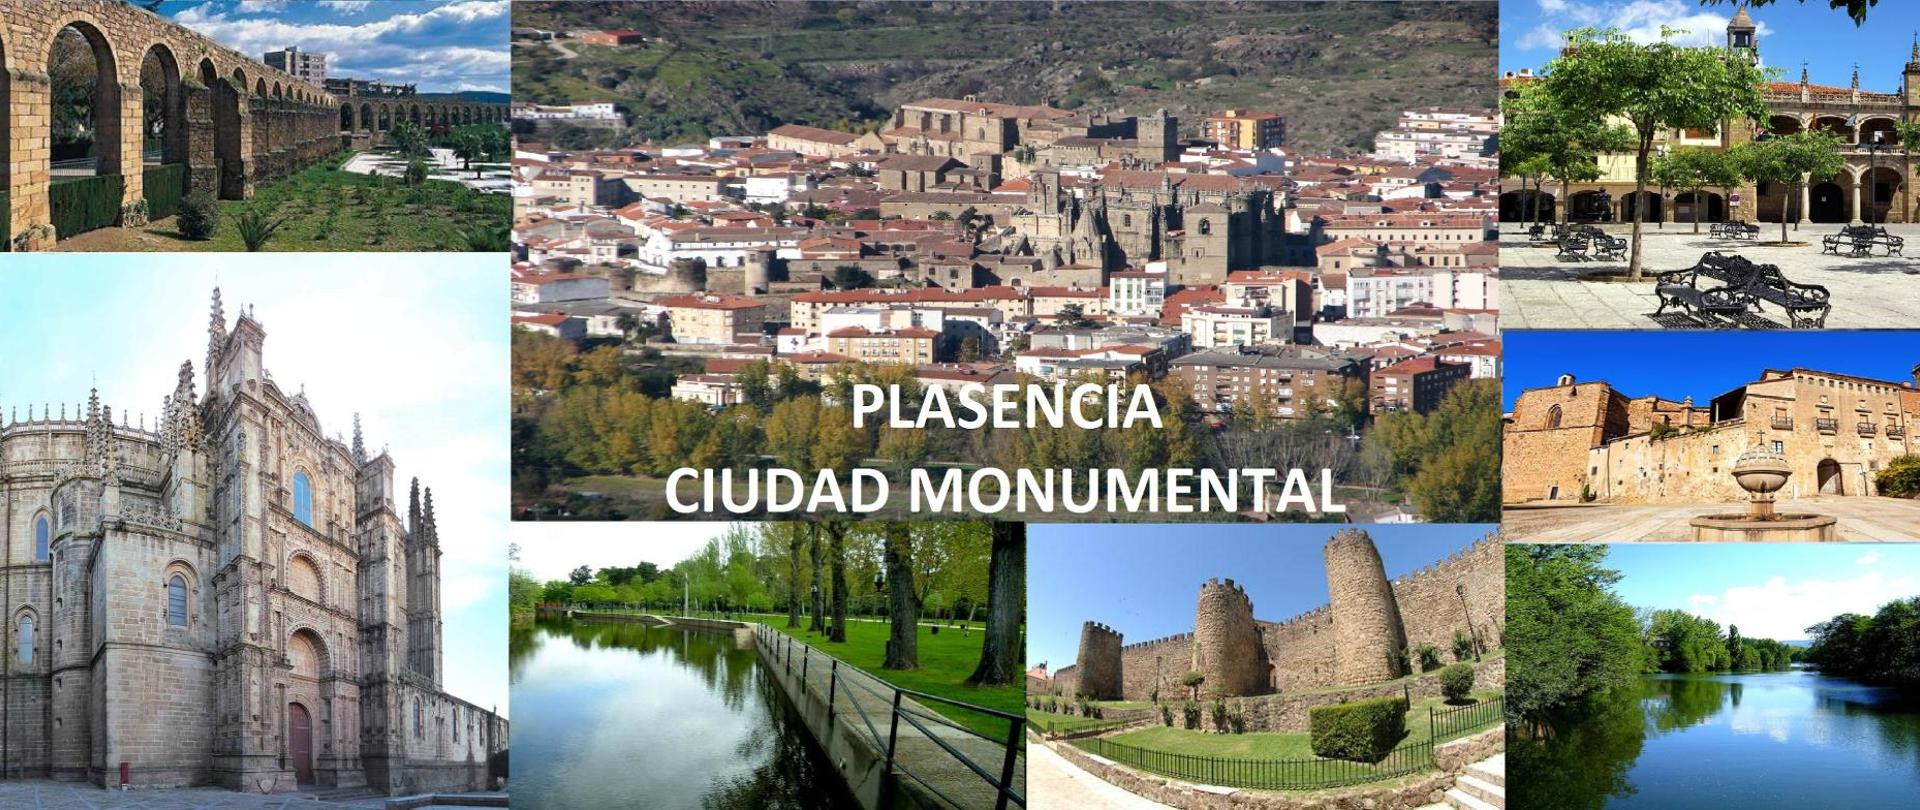 PLASENCIA CIUDAD MONUMENTAL.jpg